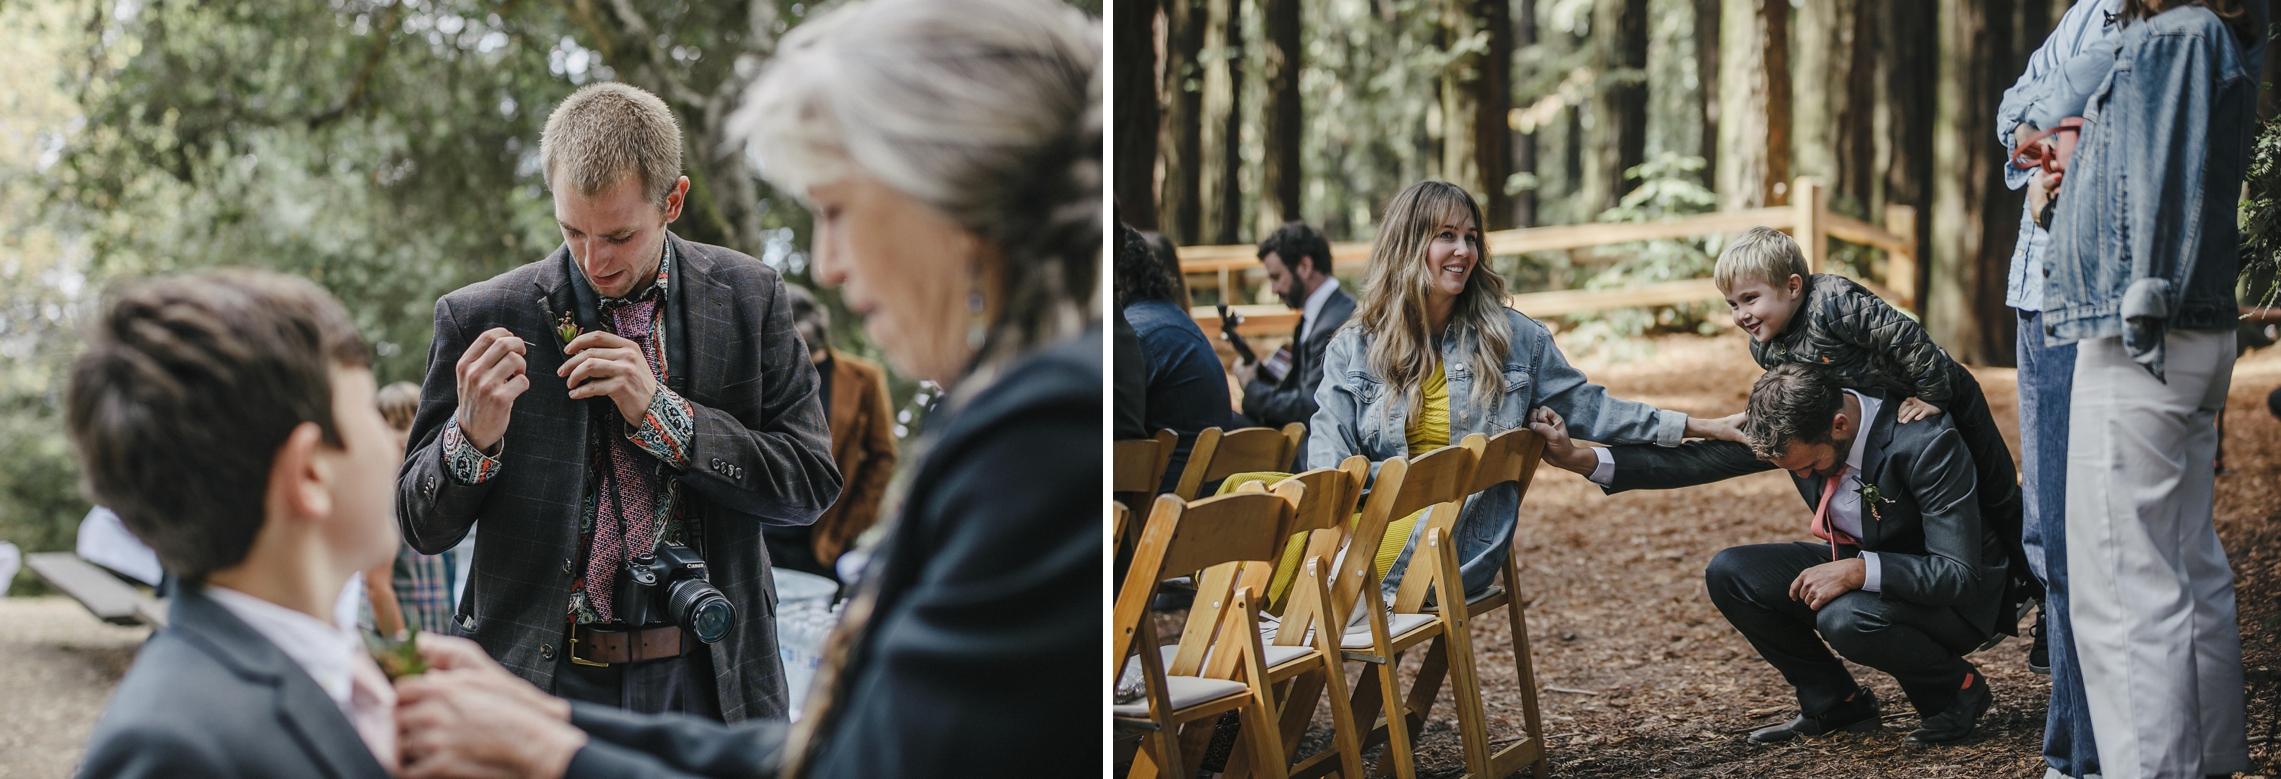 Redwood regional-oakland-wedding_0003.jpg